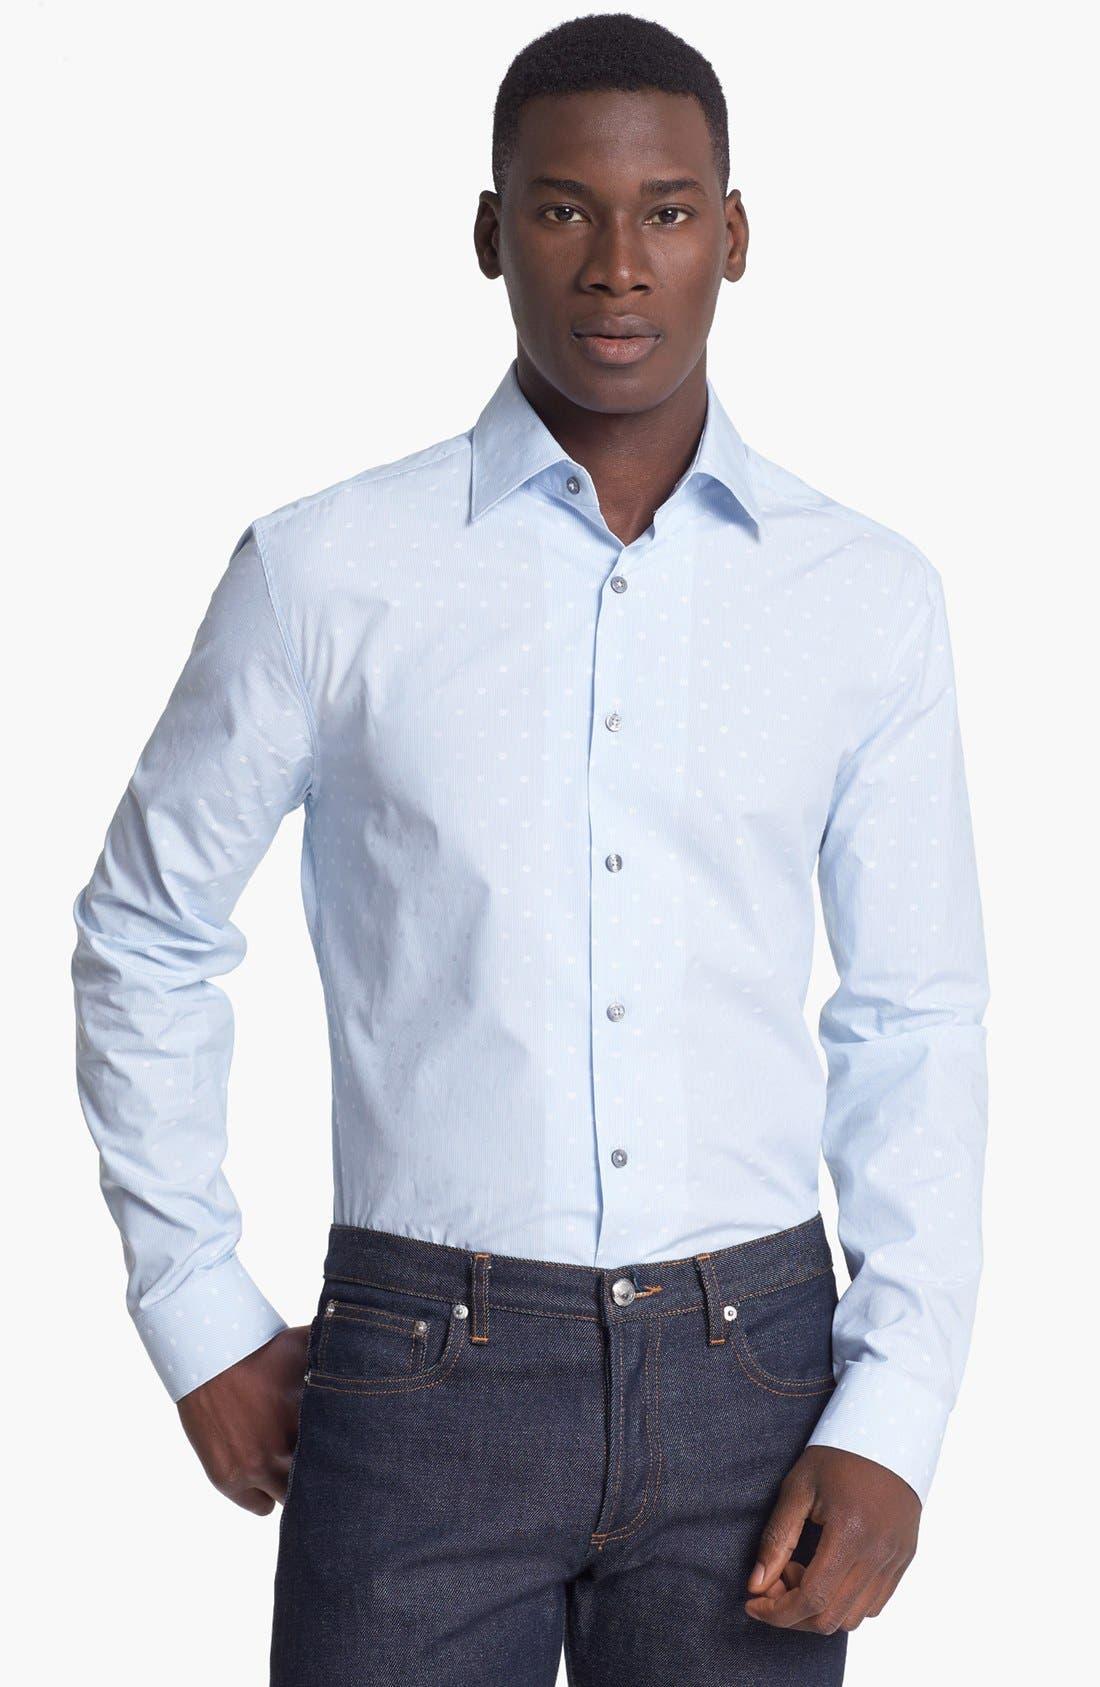 Alternate Image 1 Selected - Paul Smith London Slim Fit Dot Stripe Dress Shirt